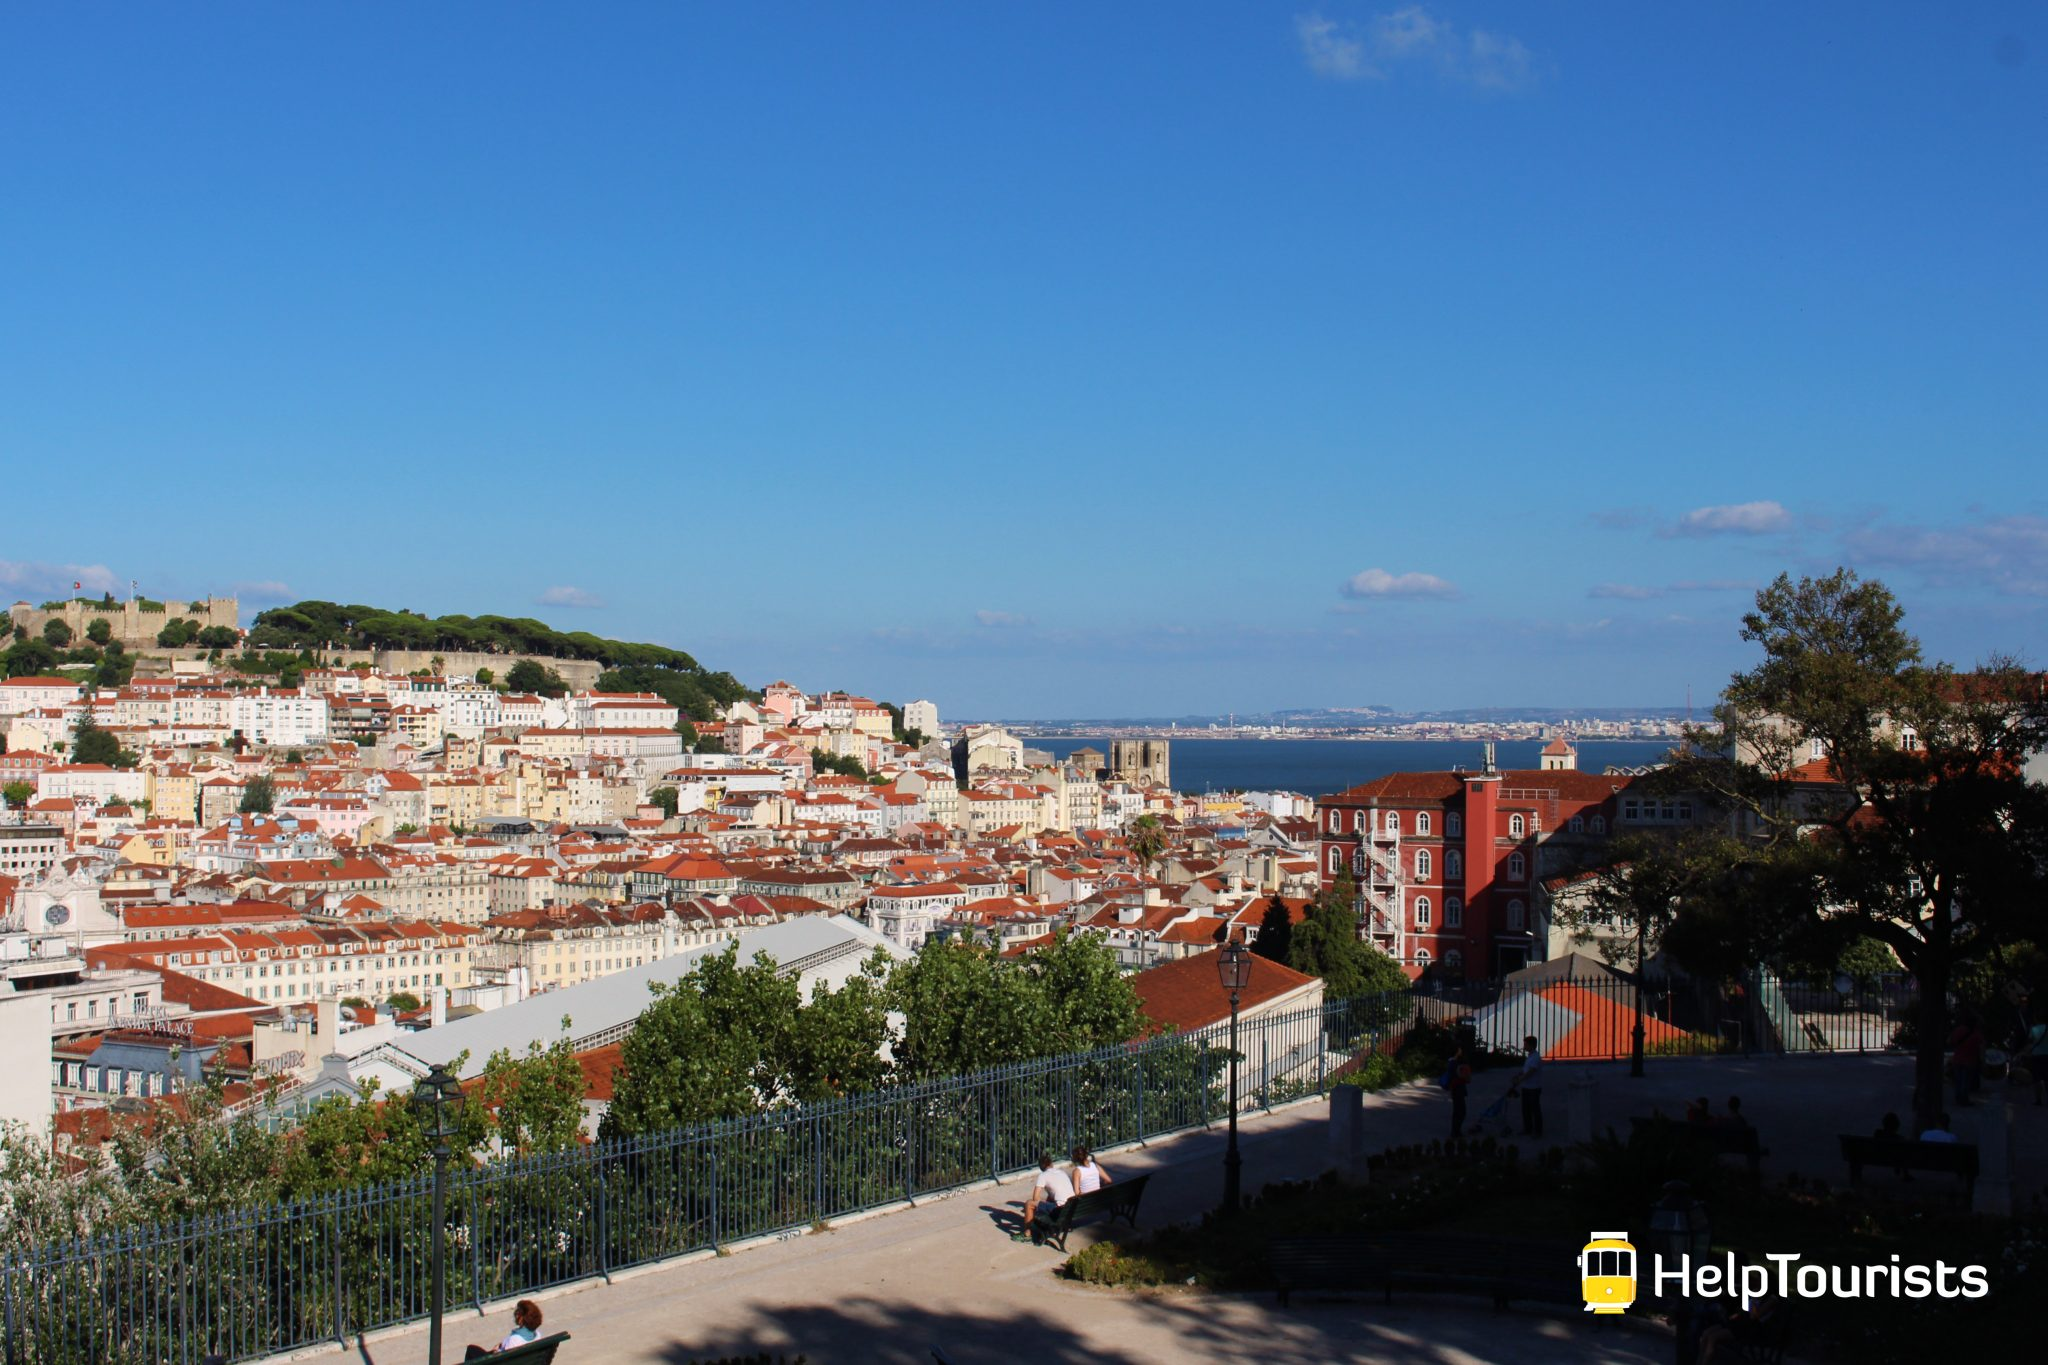 LISSABON_Jardim-de-Sao-Pedro-de-Alcantara_l